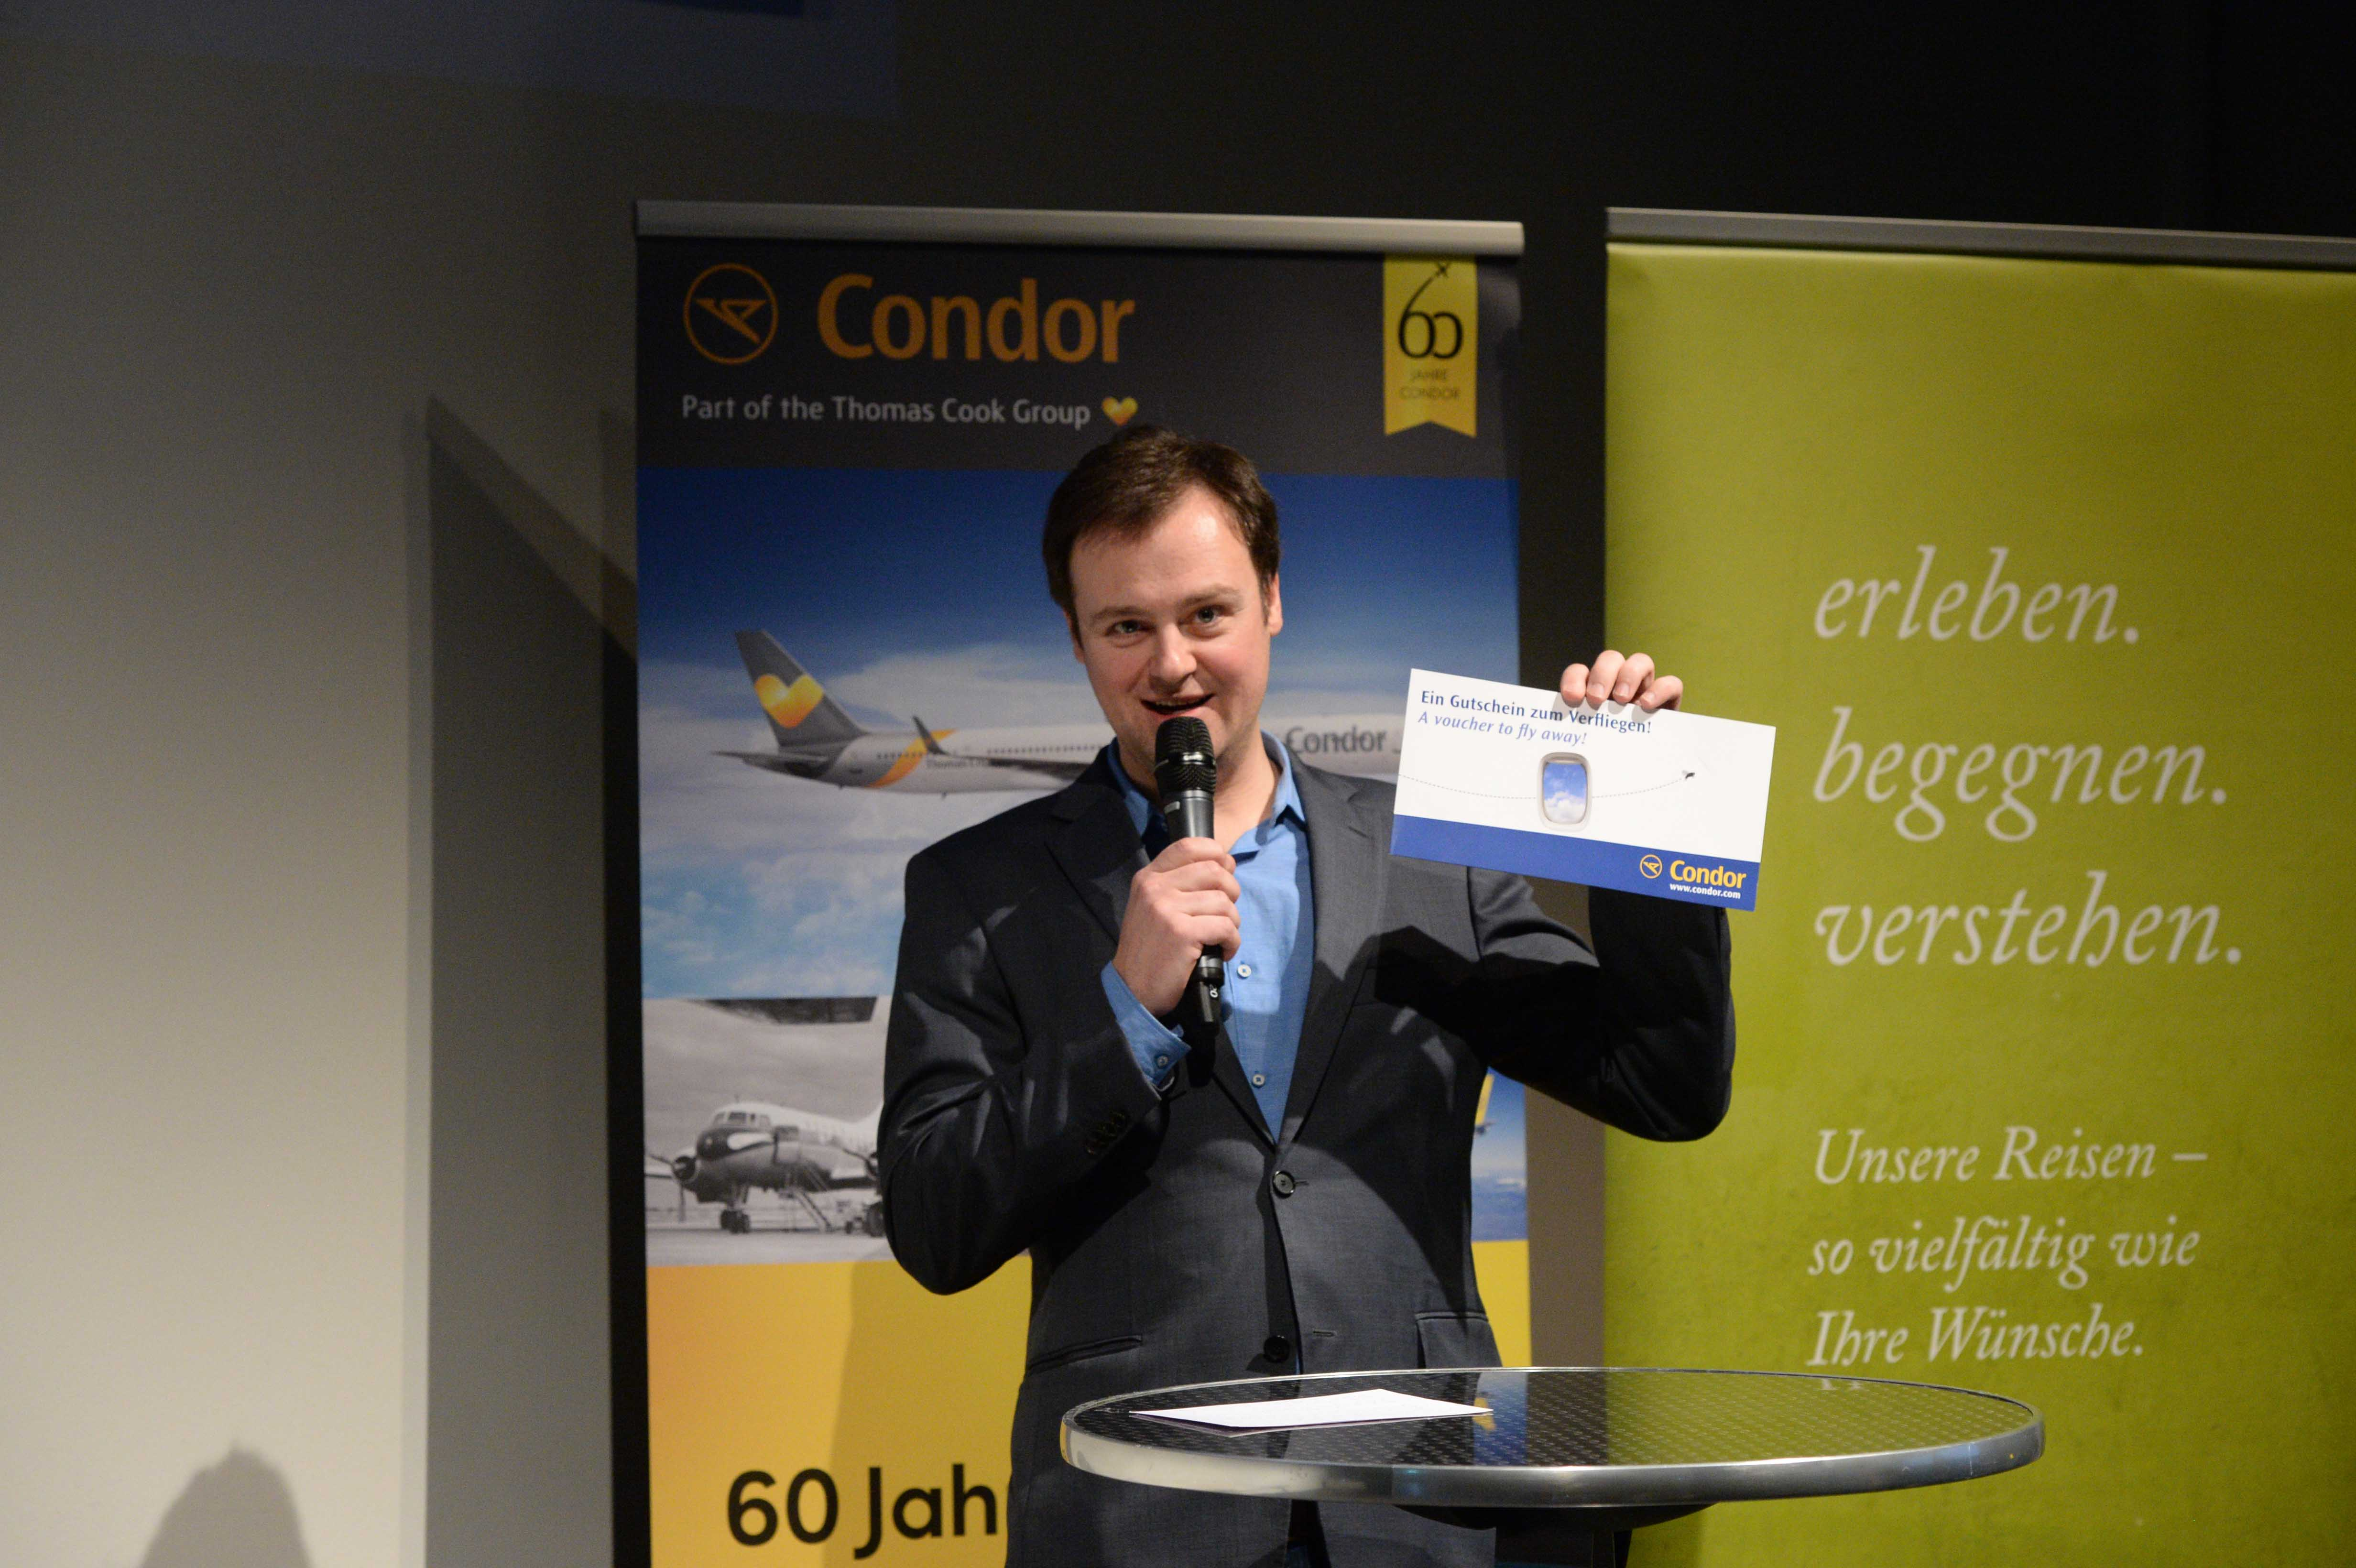 Columbus Autoren Preisverleihung 2015 Christian Leetz Gutschein Condor web